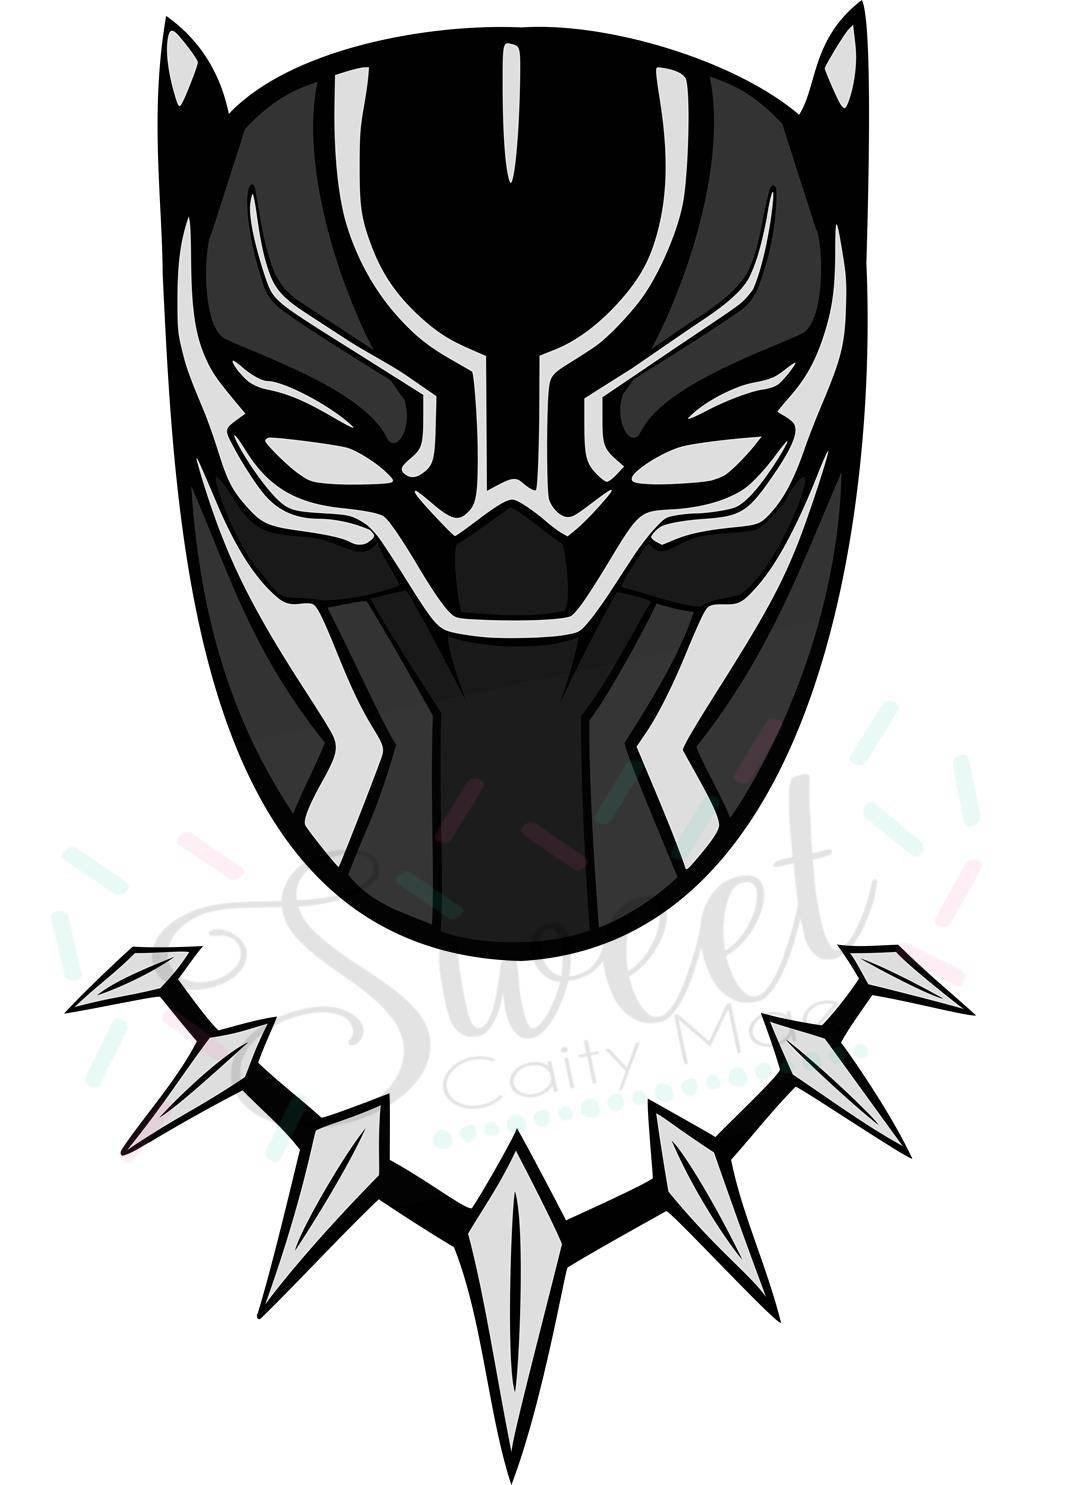 Black panther marvel vector Inspirational black panther clipart.